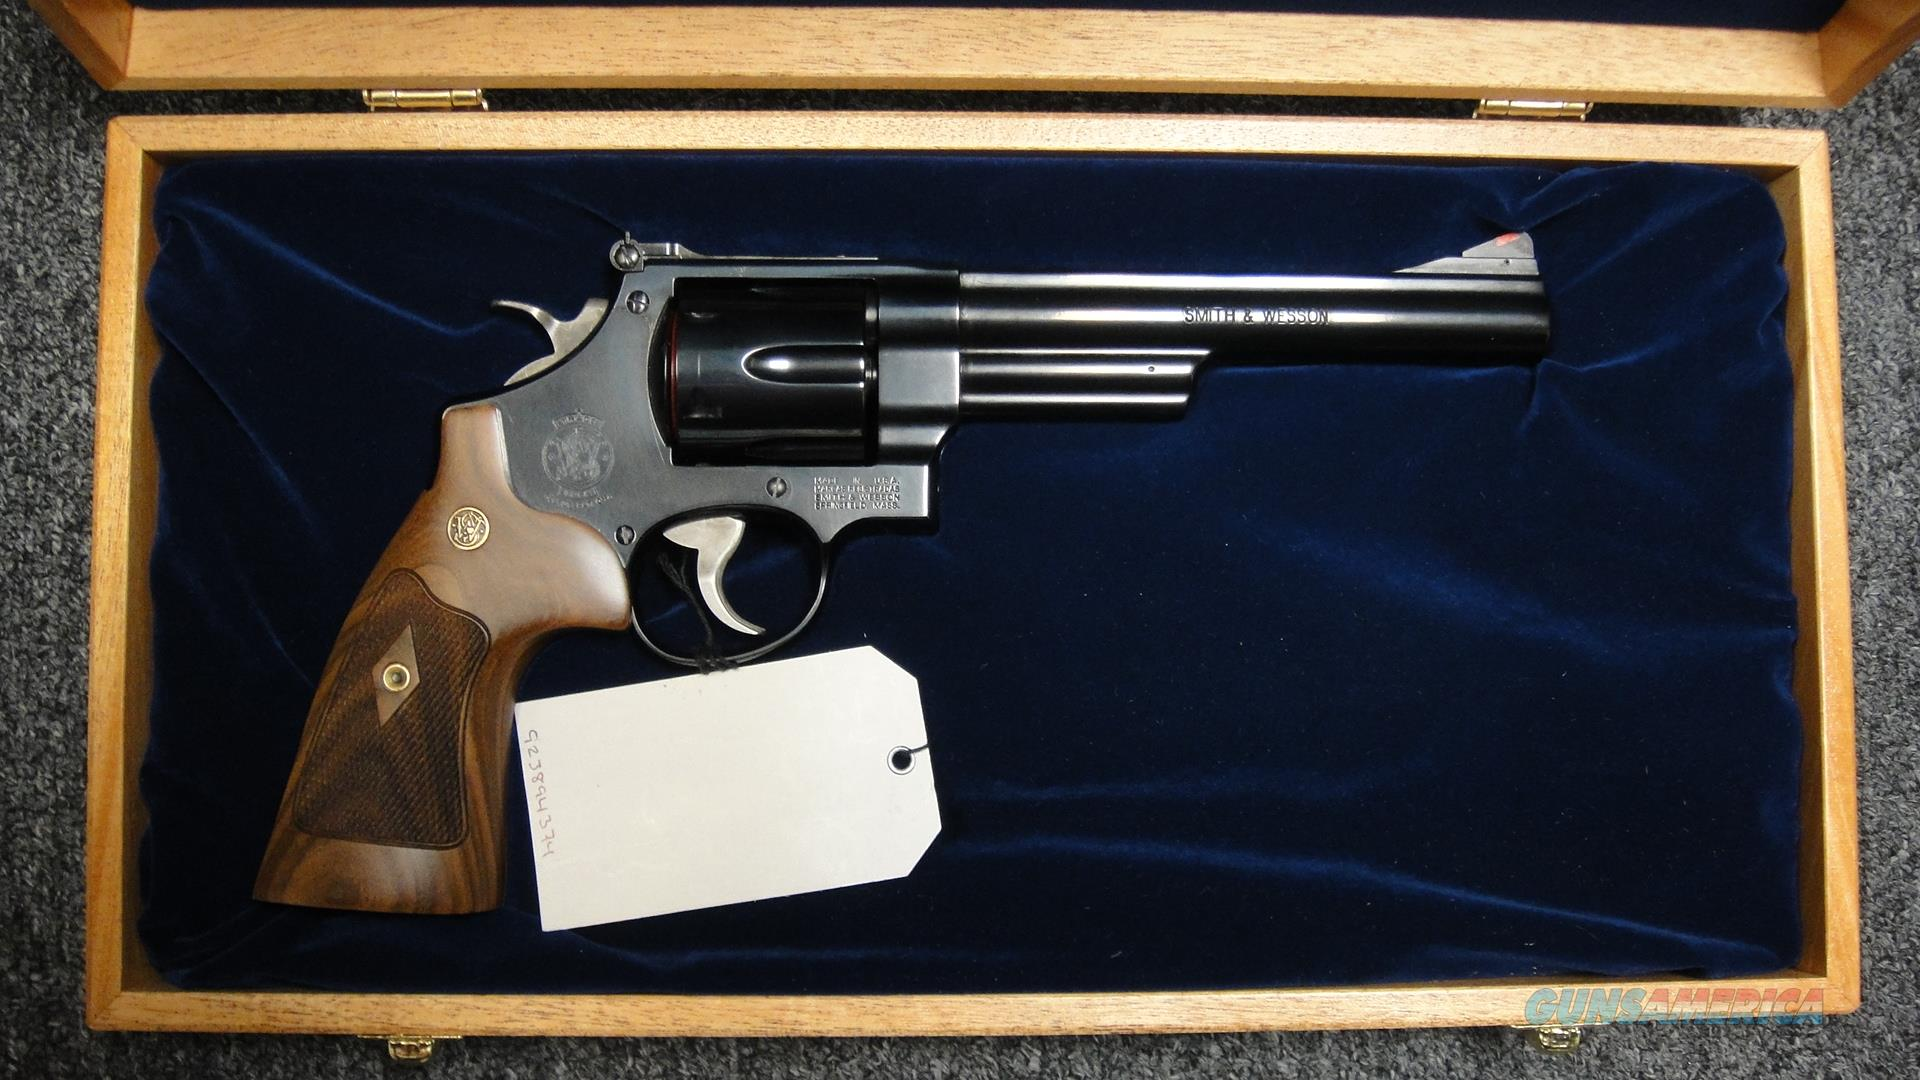 Smith & Wesson Model 29-10 .44 Magnum w/ Mohagony Case  Guns > Pistols > Smith & Wesson Revolvers > Full Frame Revolver